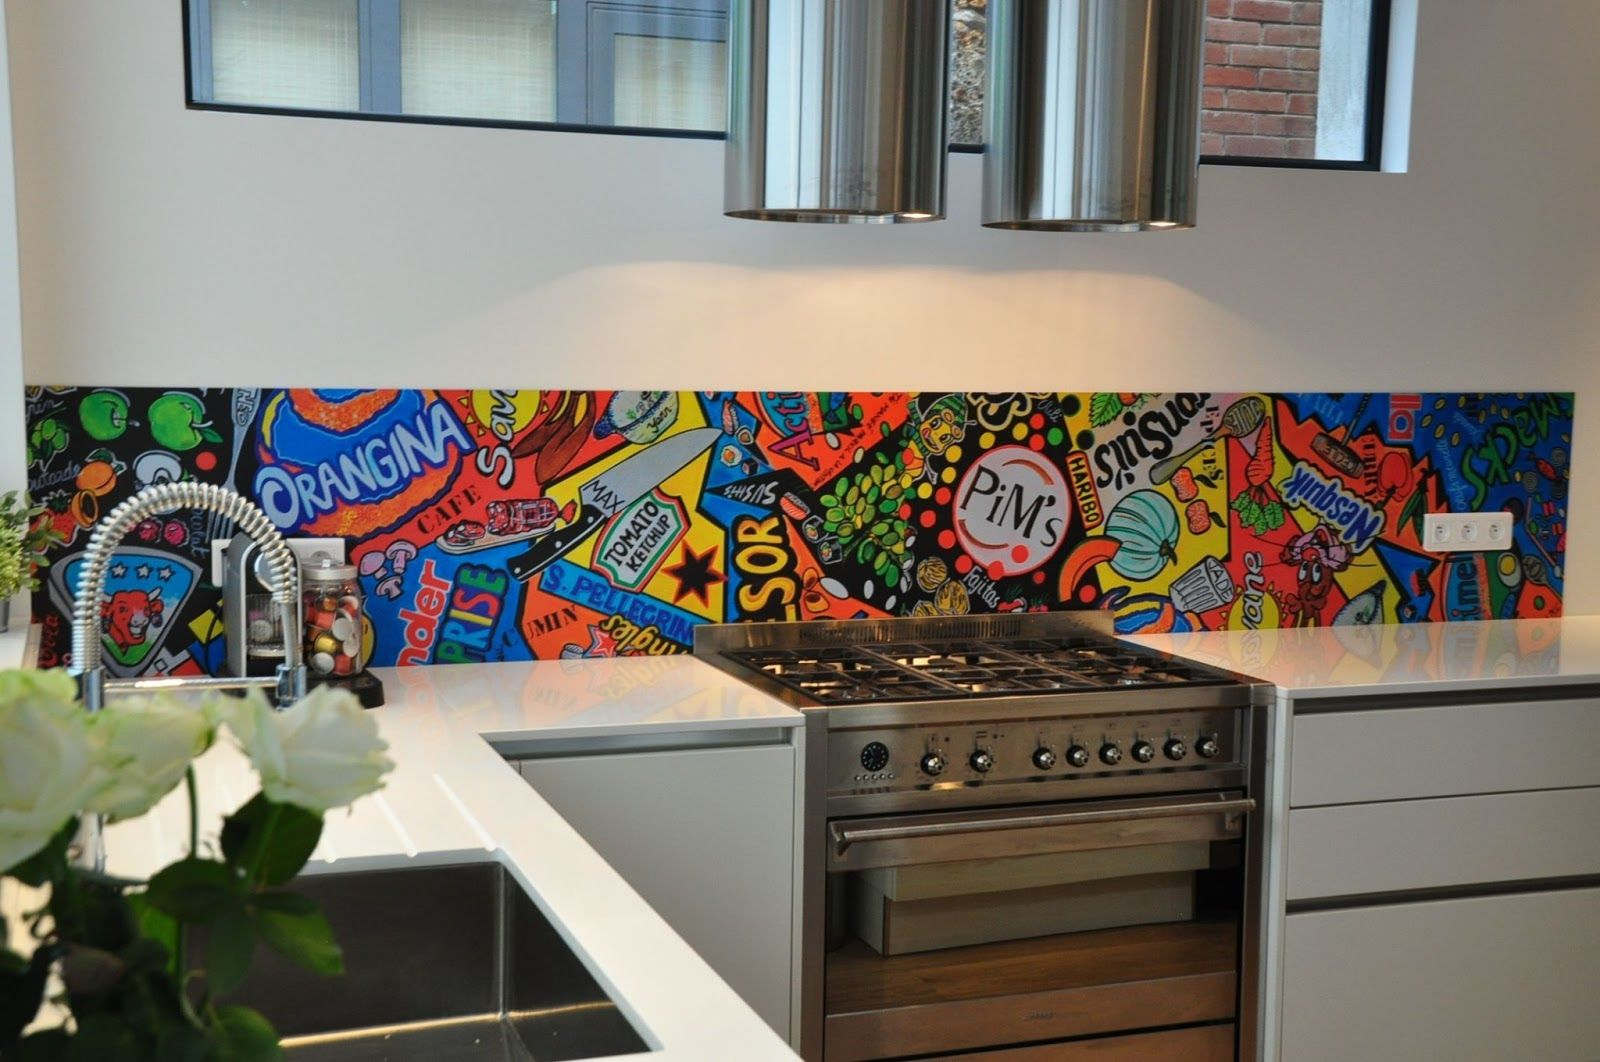 cr dence cuisine color e recherche google cuisine pinterest cuisine and search. Black Bedroom Furniture Sets. Home Design Ideas